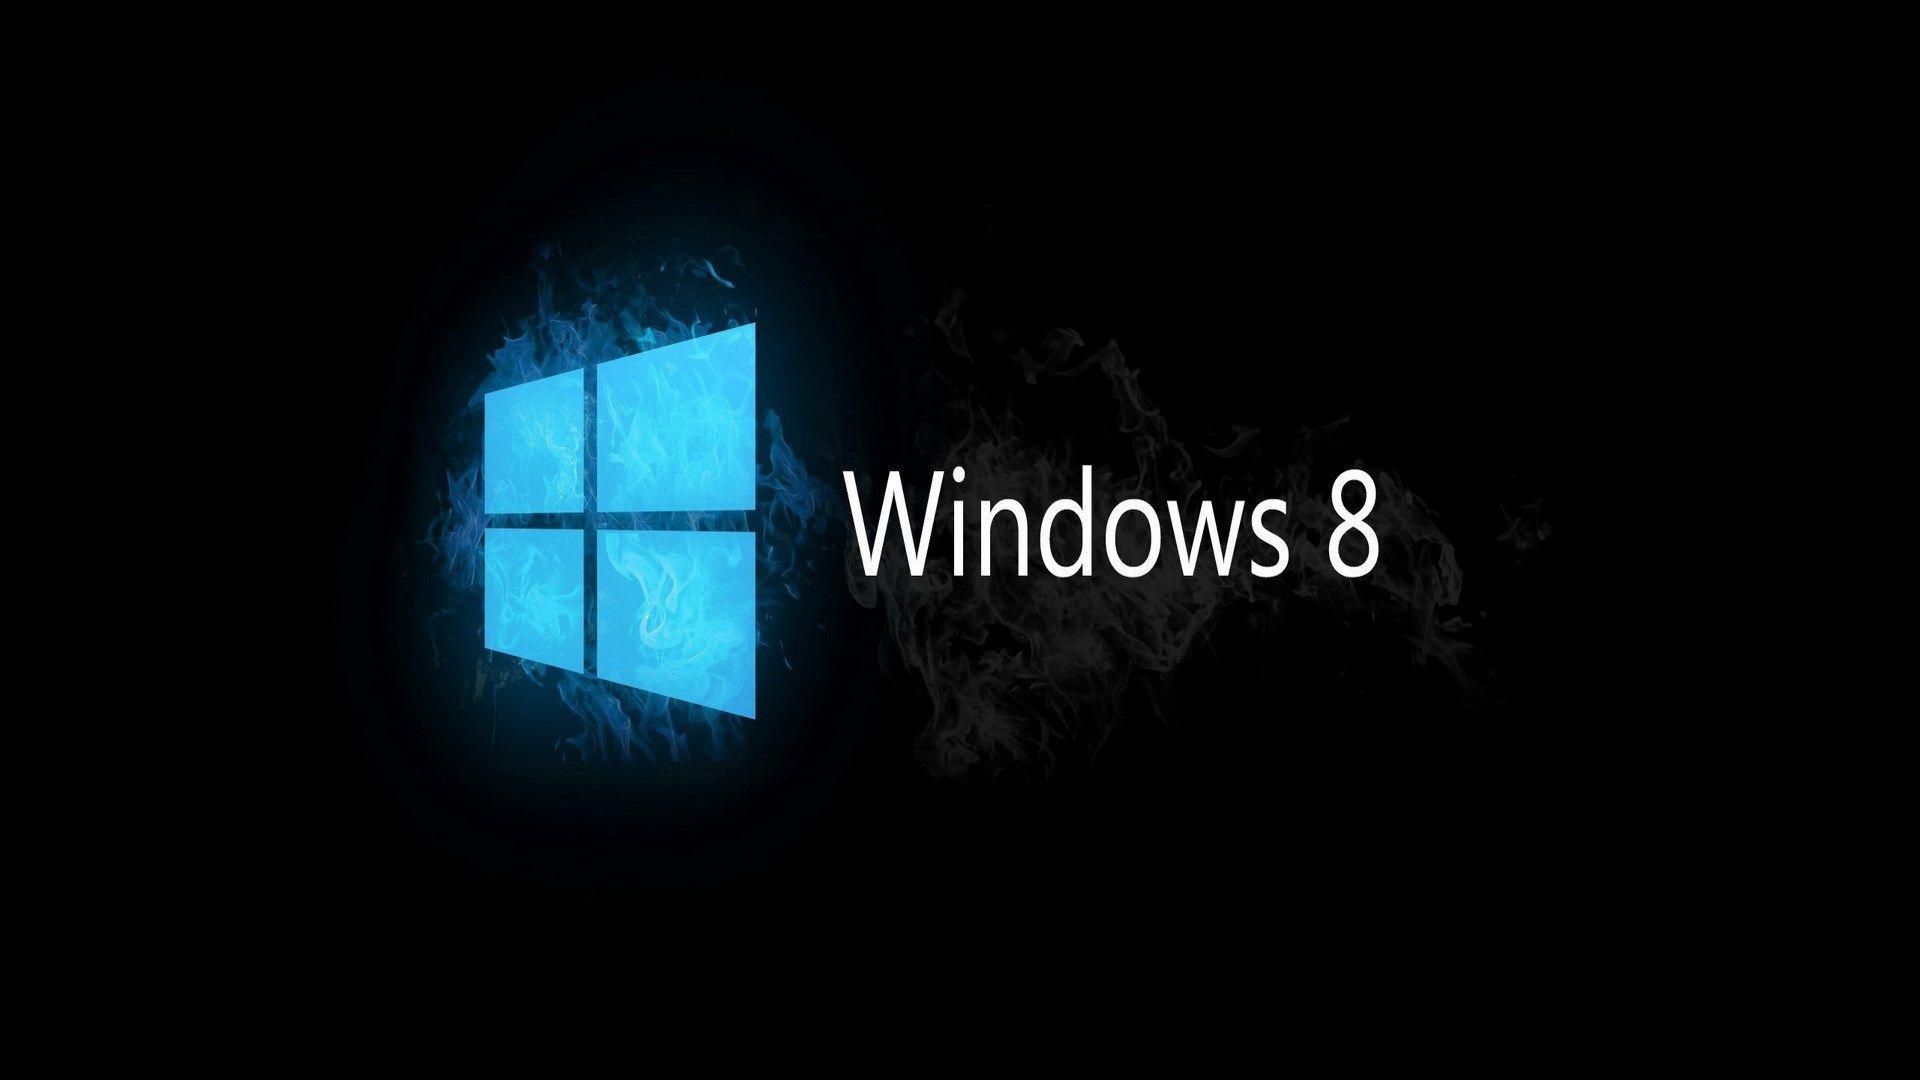 1920x1080 Hd Wallpaper Windows 8 Windows Wallpaper Hd Wallpaper